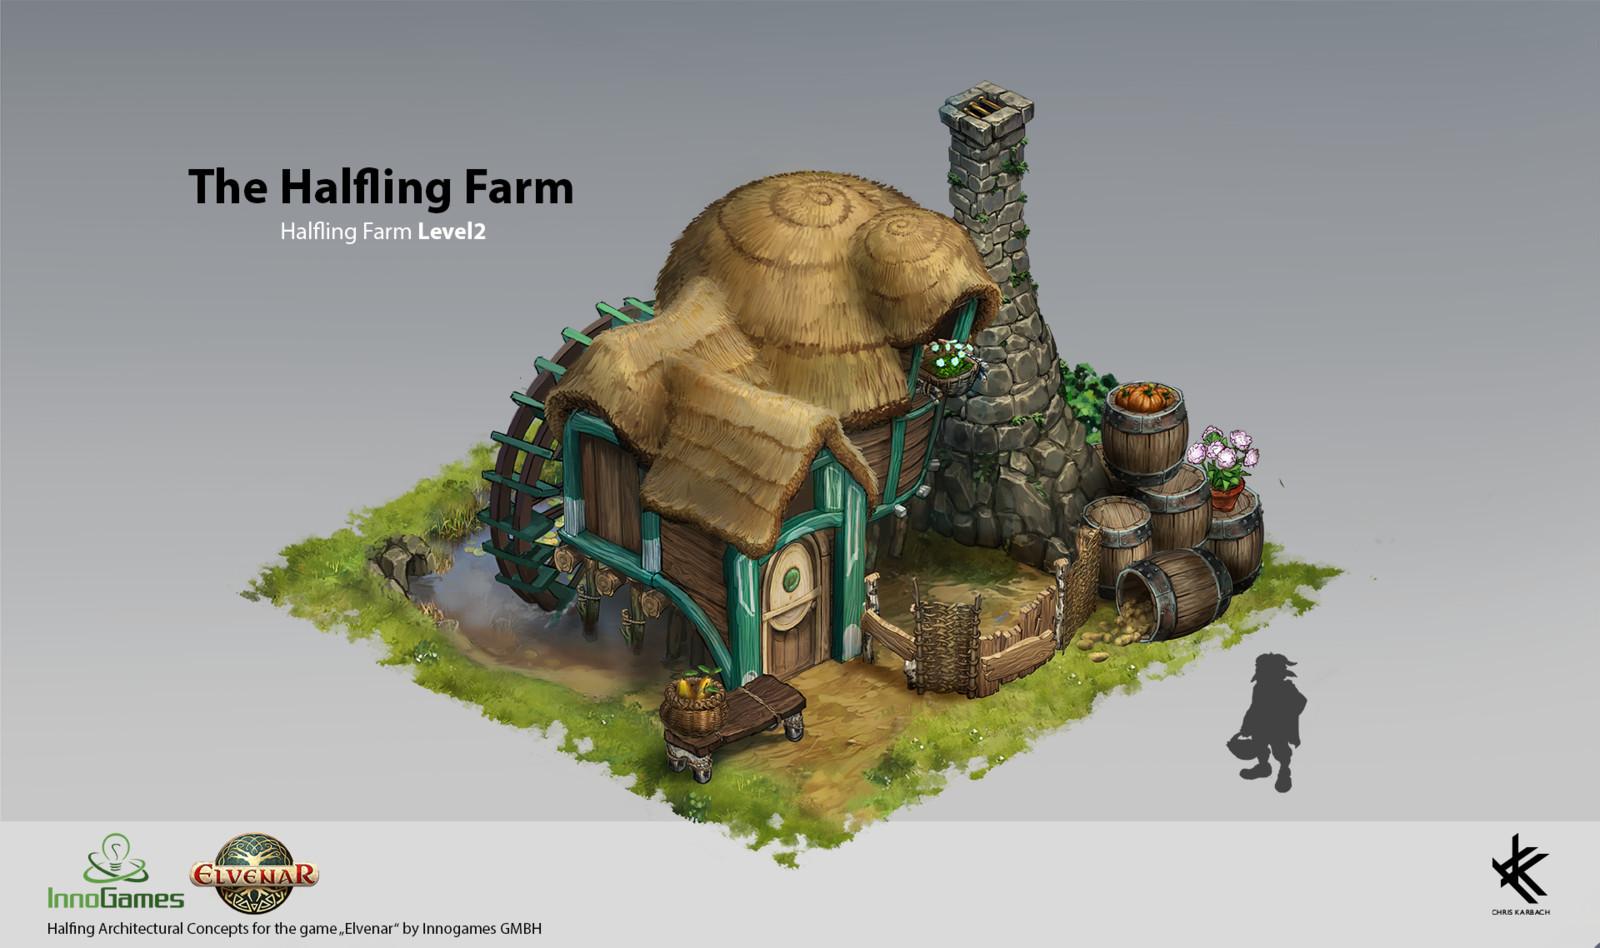 Halfling Farm Level 2